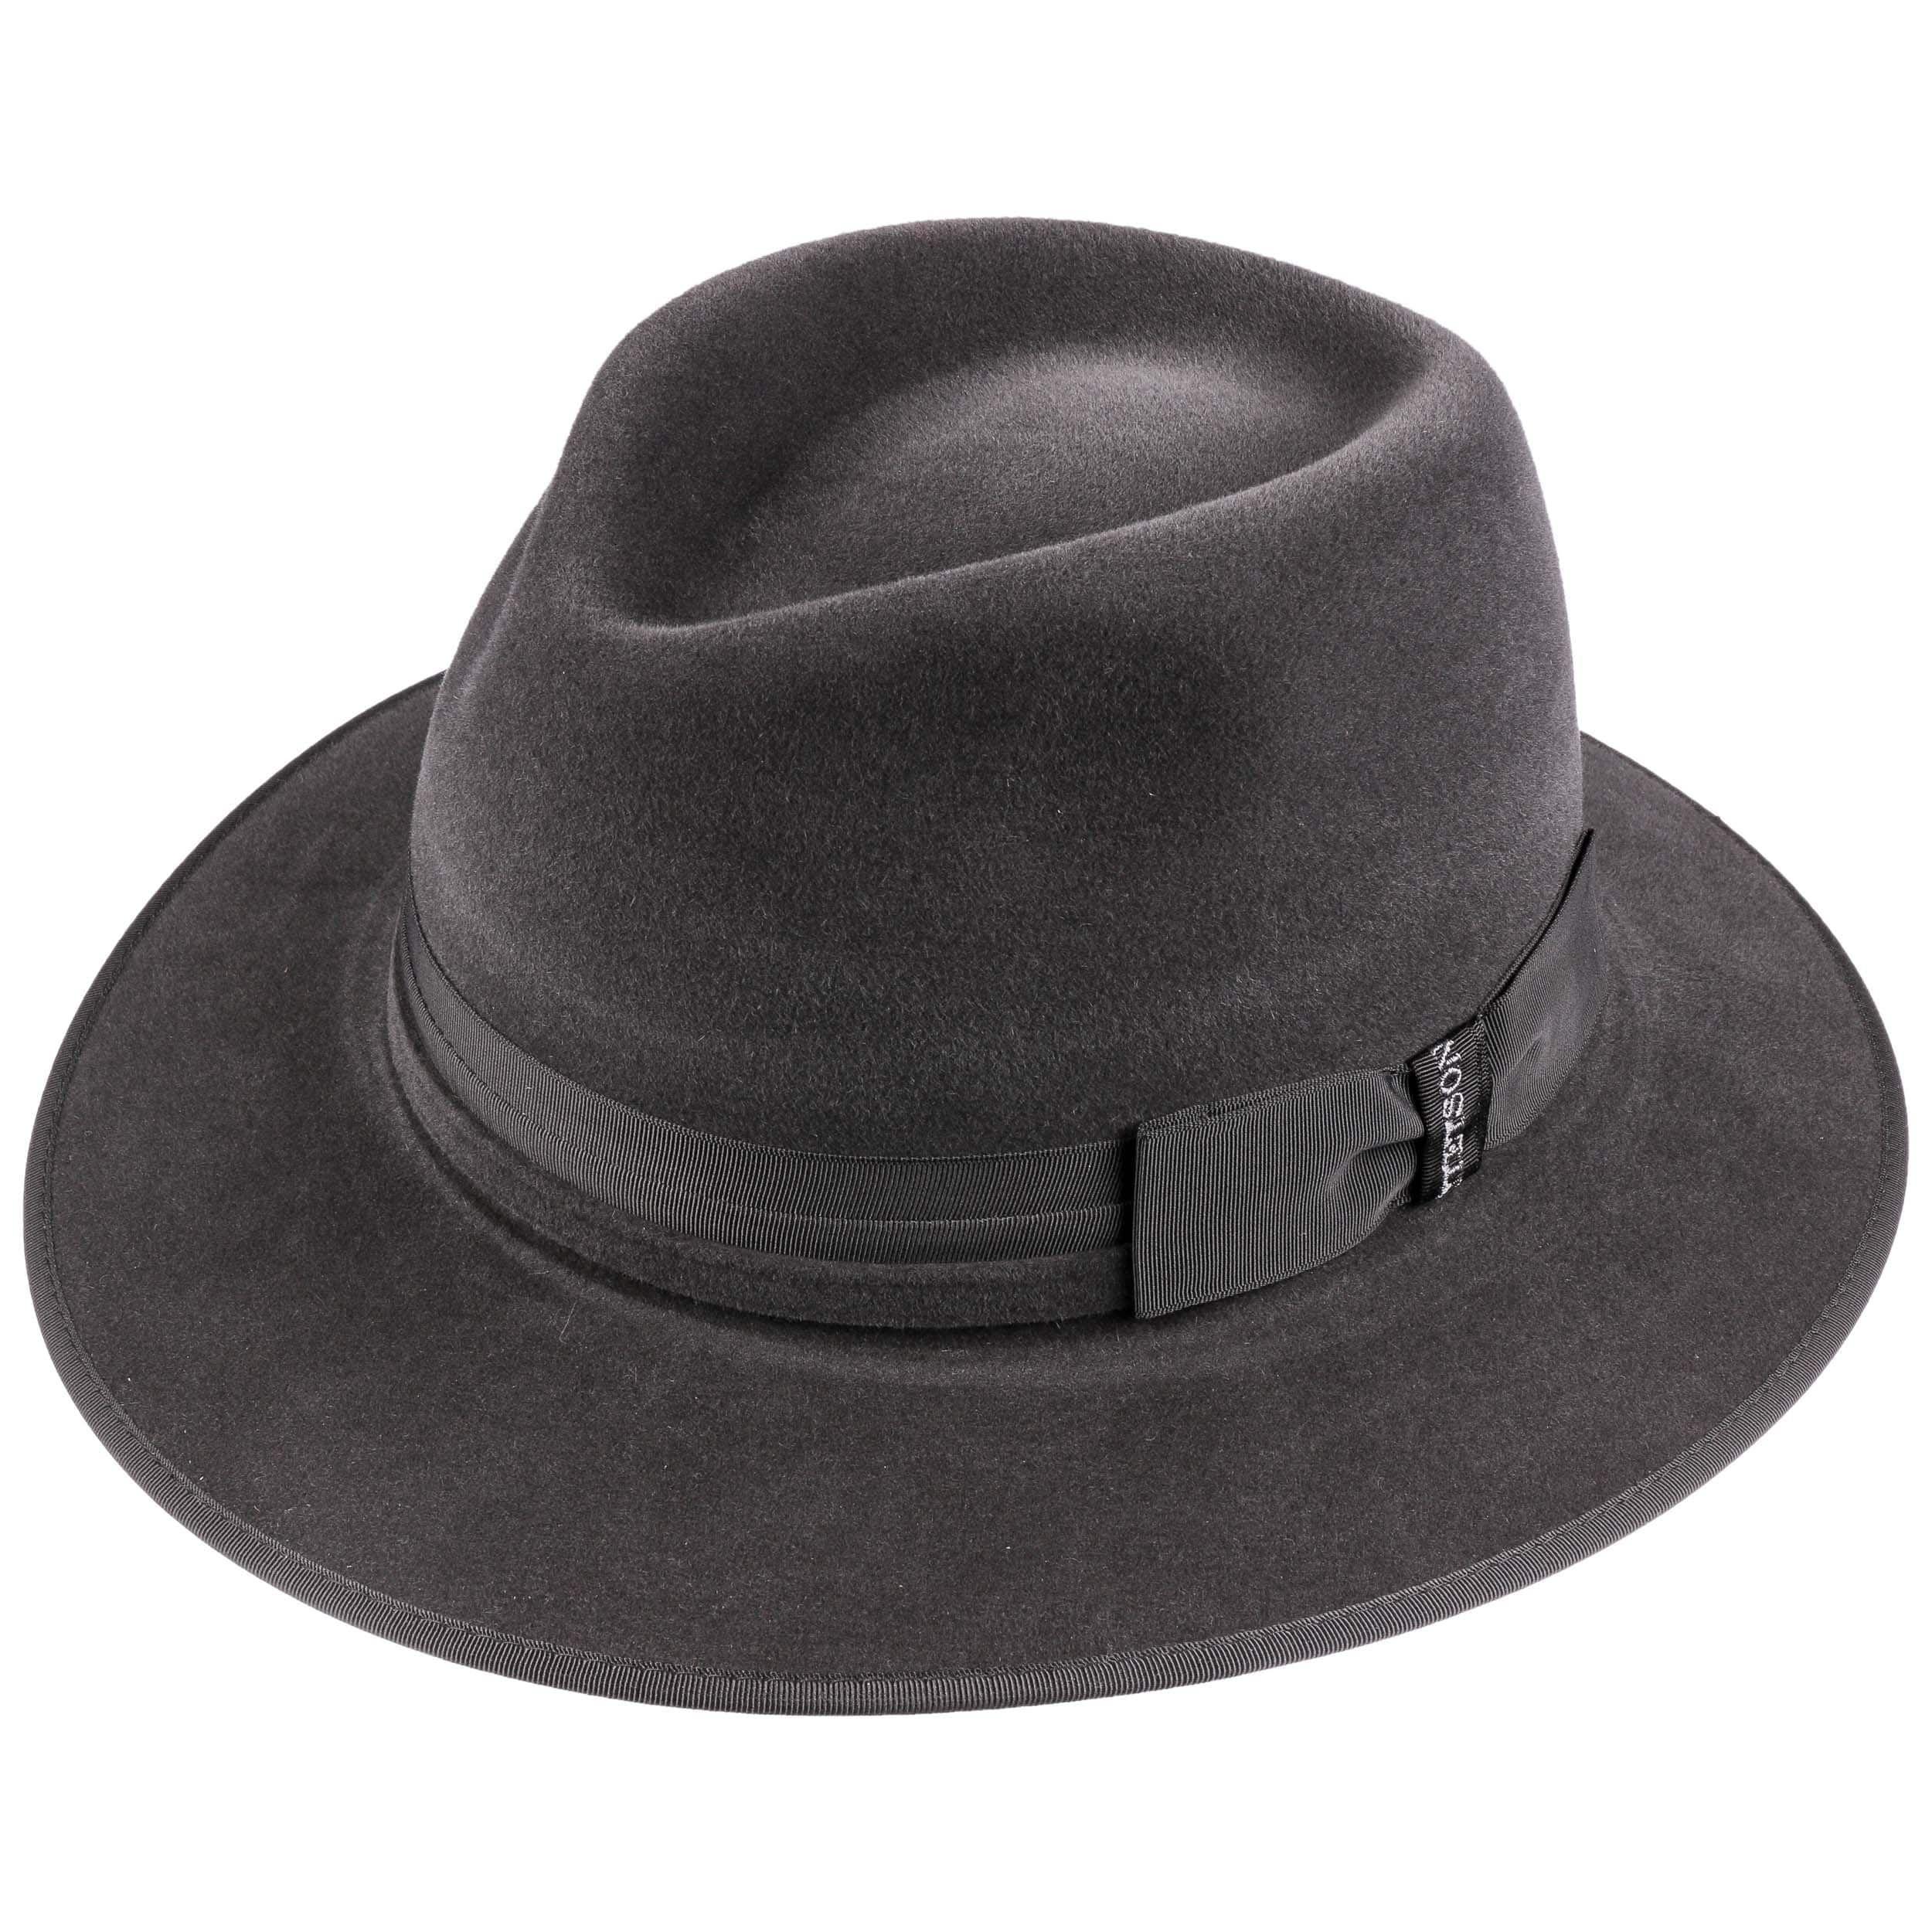 Stuart Traveller Fur Felt Hat anthracite